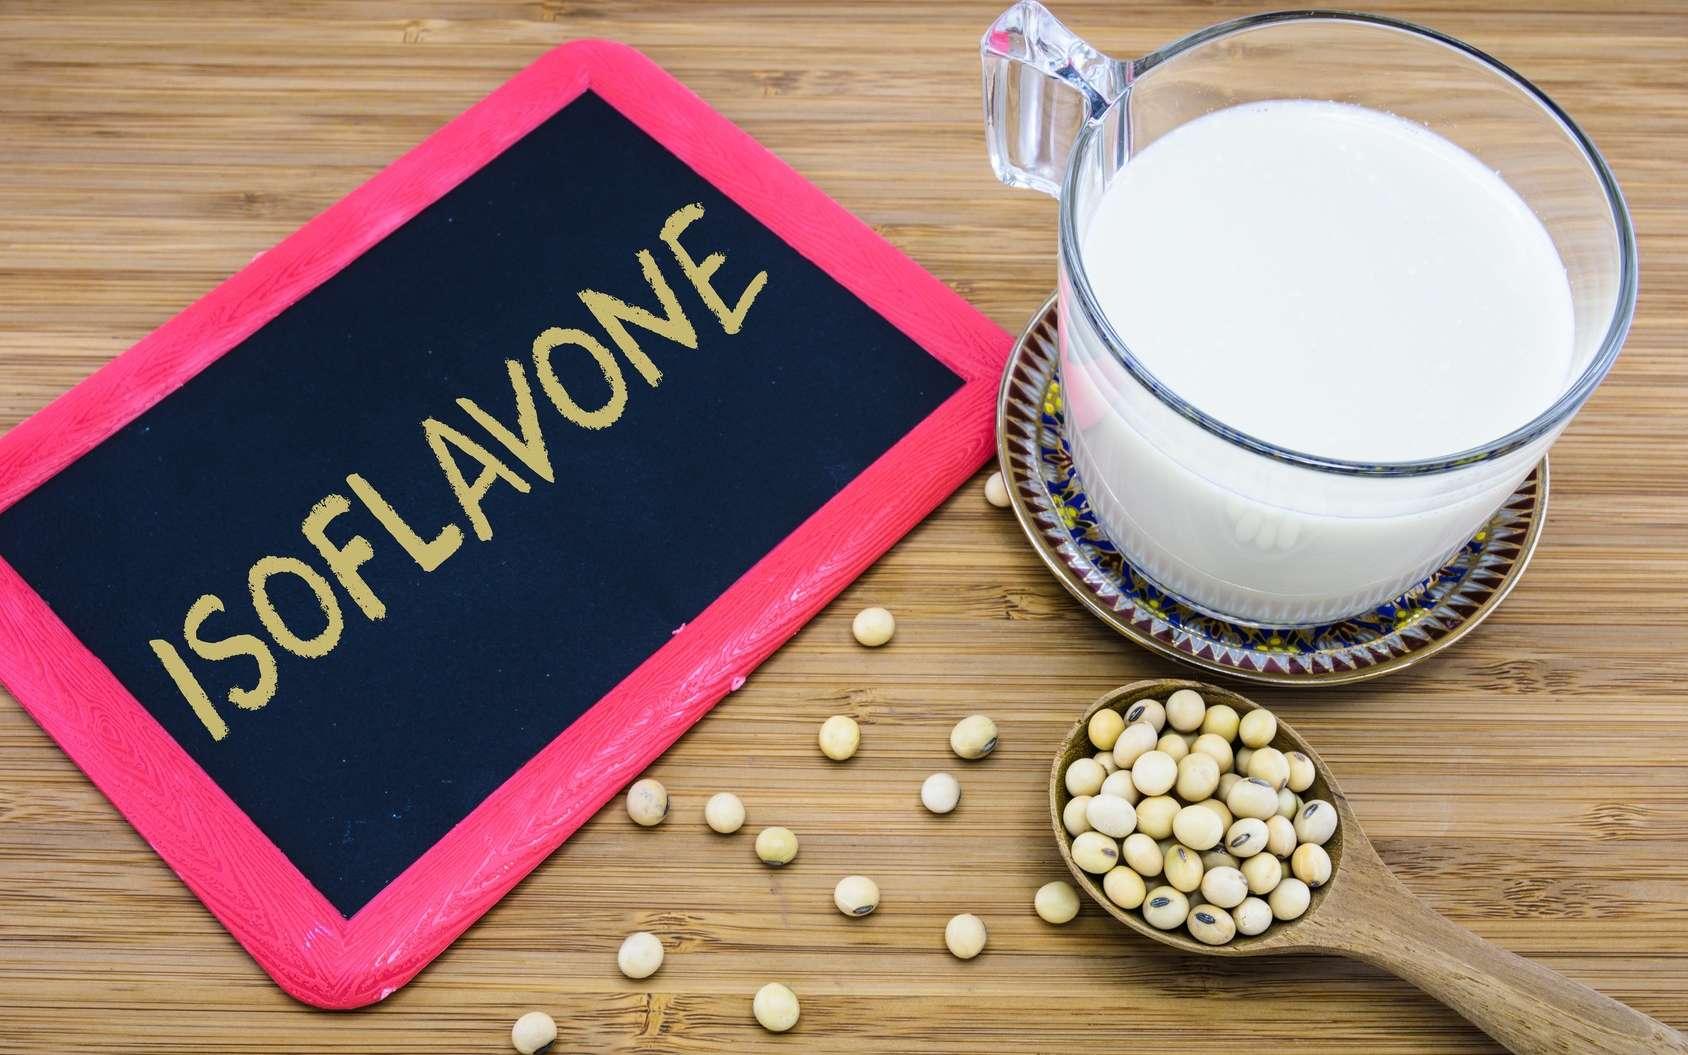 Le soja contient des isoflavones qui sont des pytoestrogènes. © topteen, Fotolia